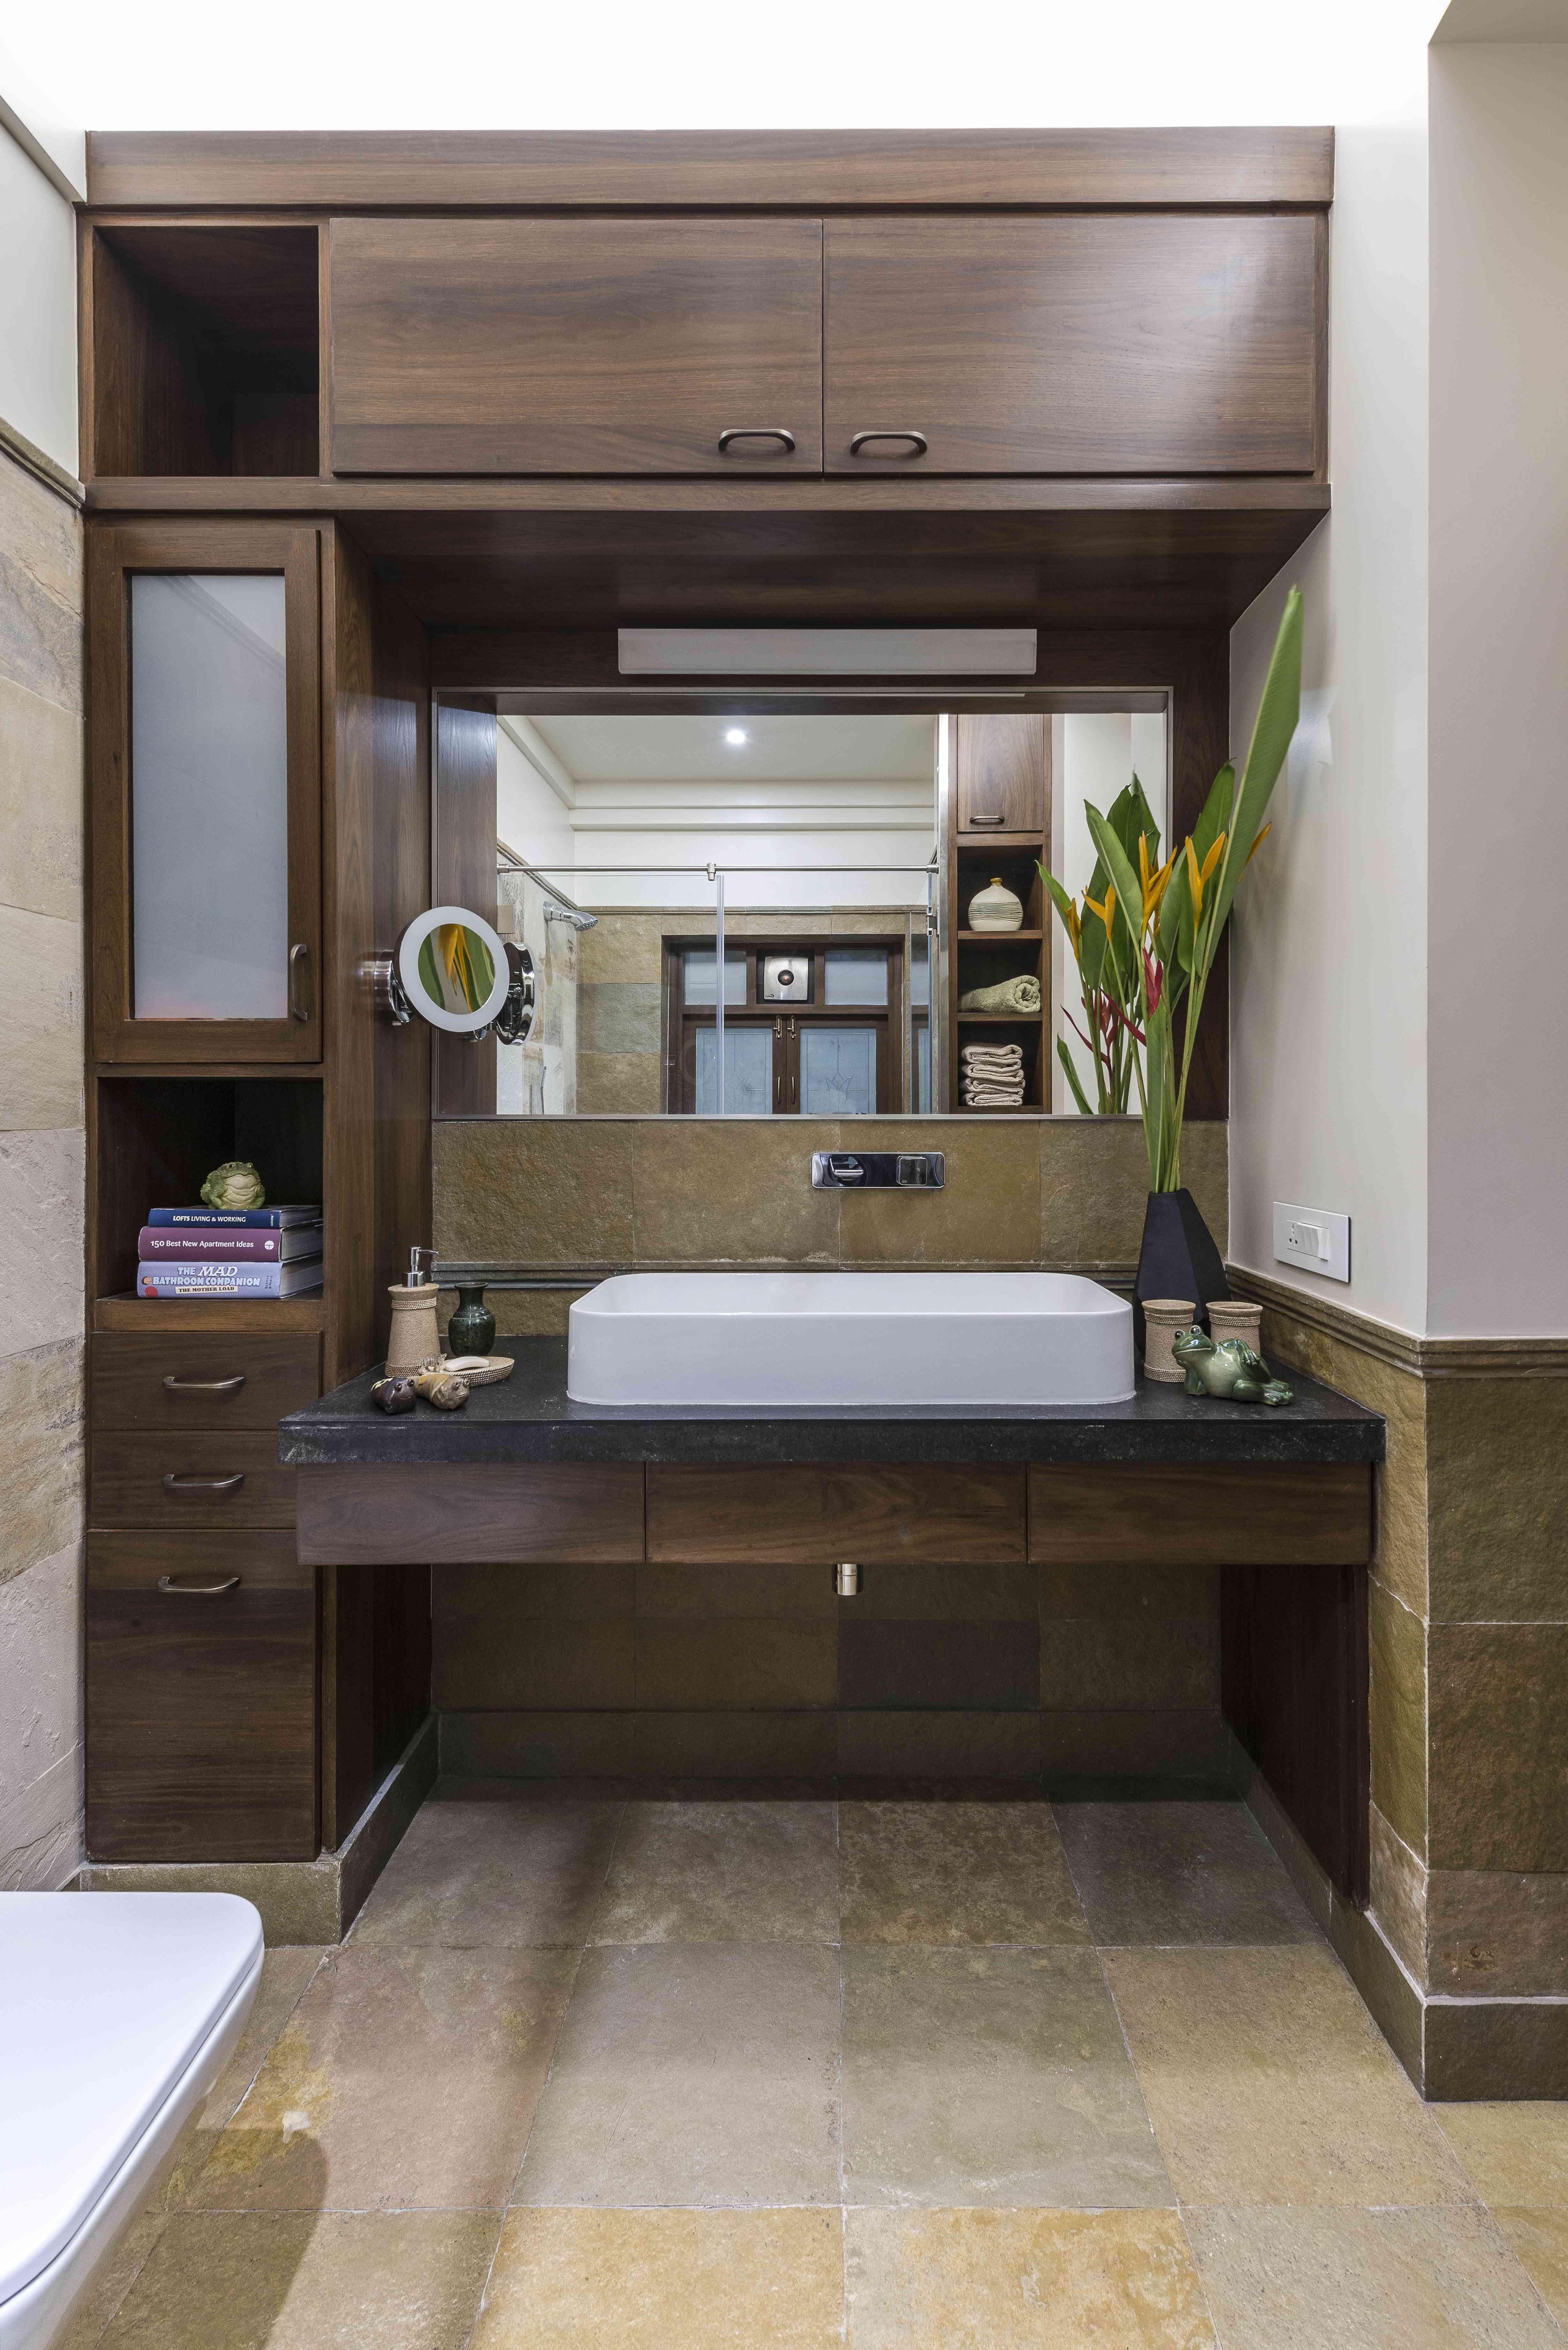 Bathroom interiors Ar Puran Kumar